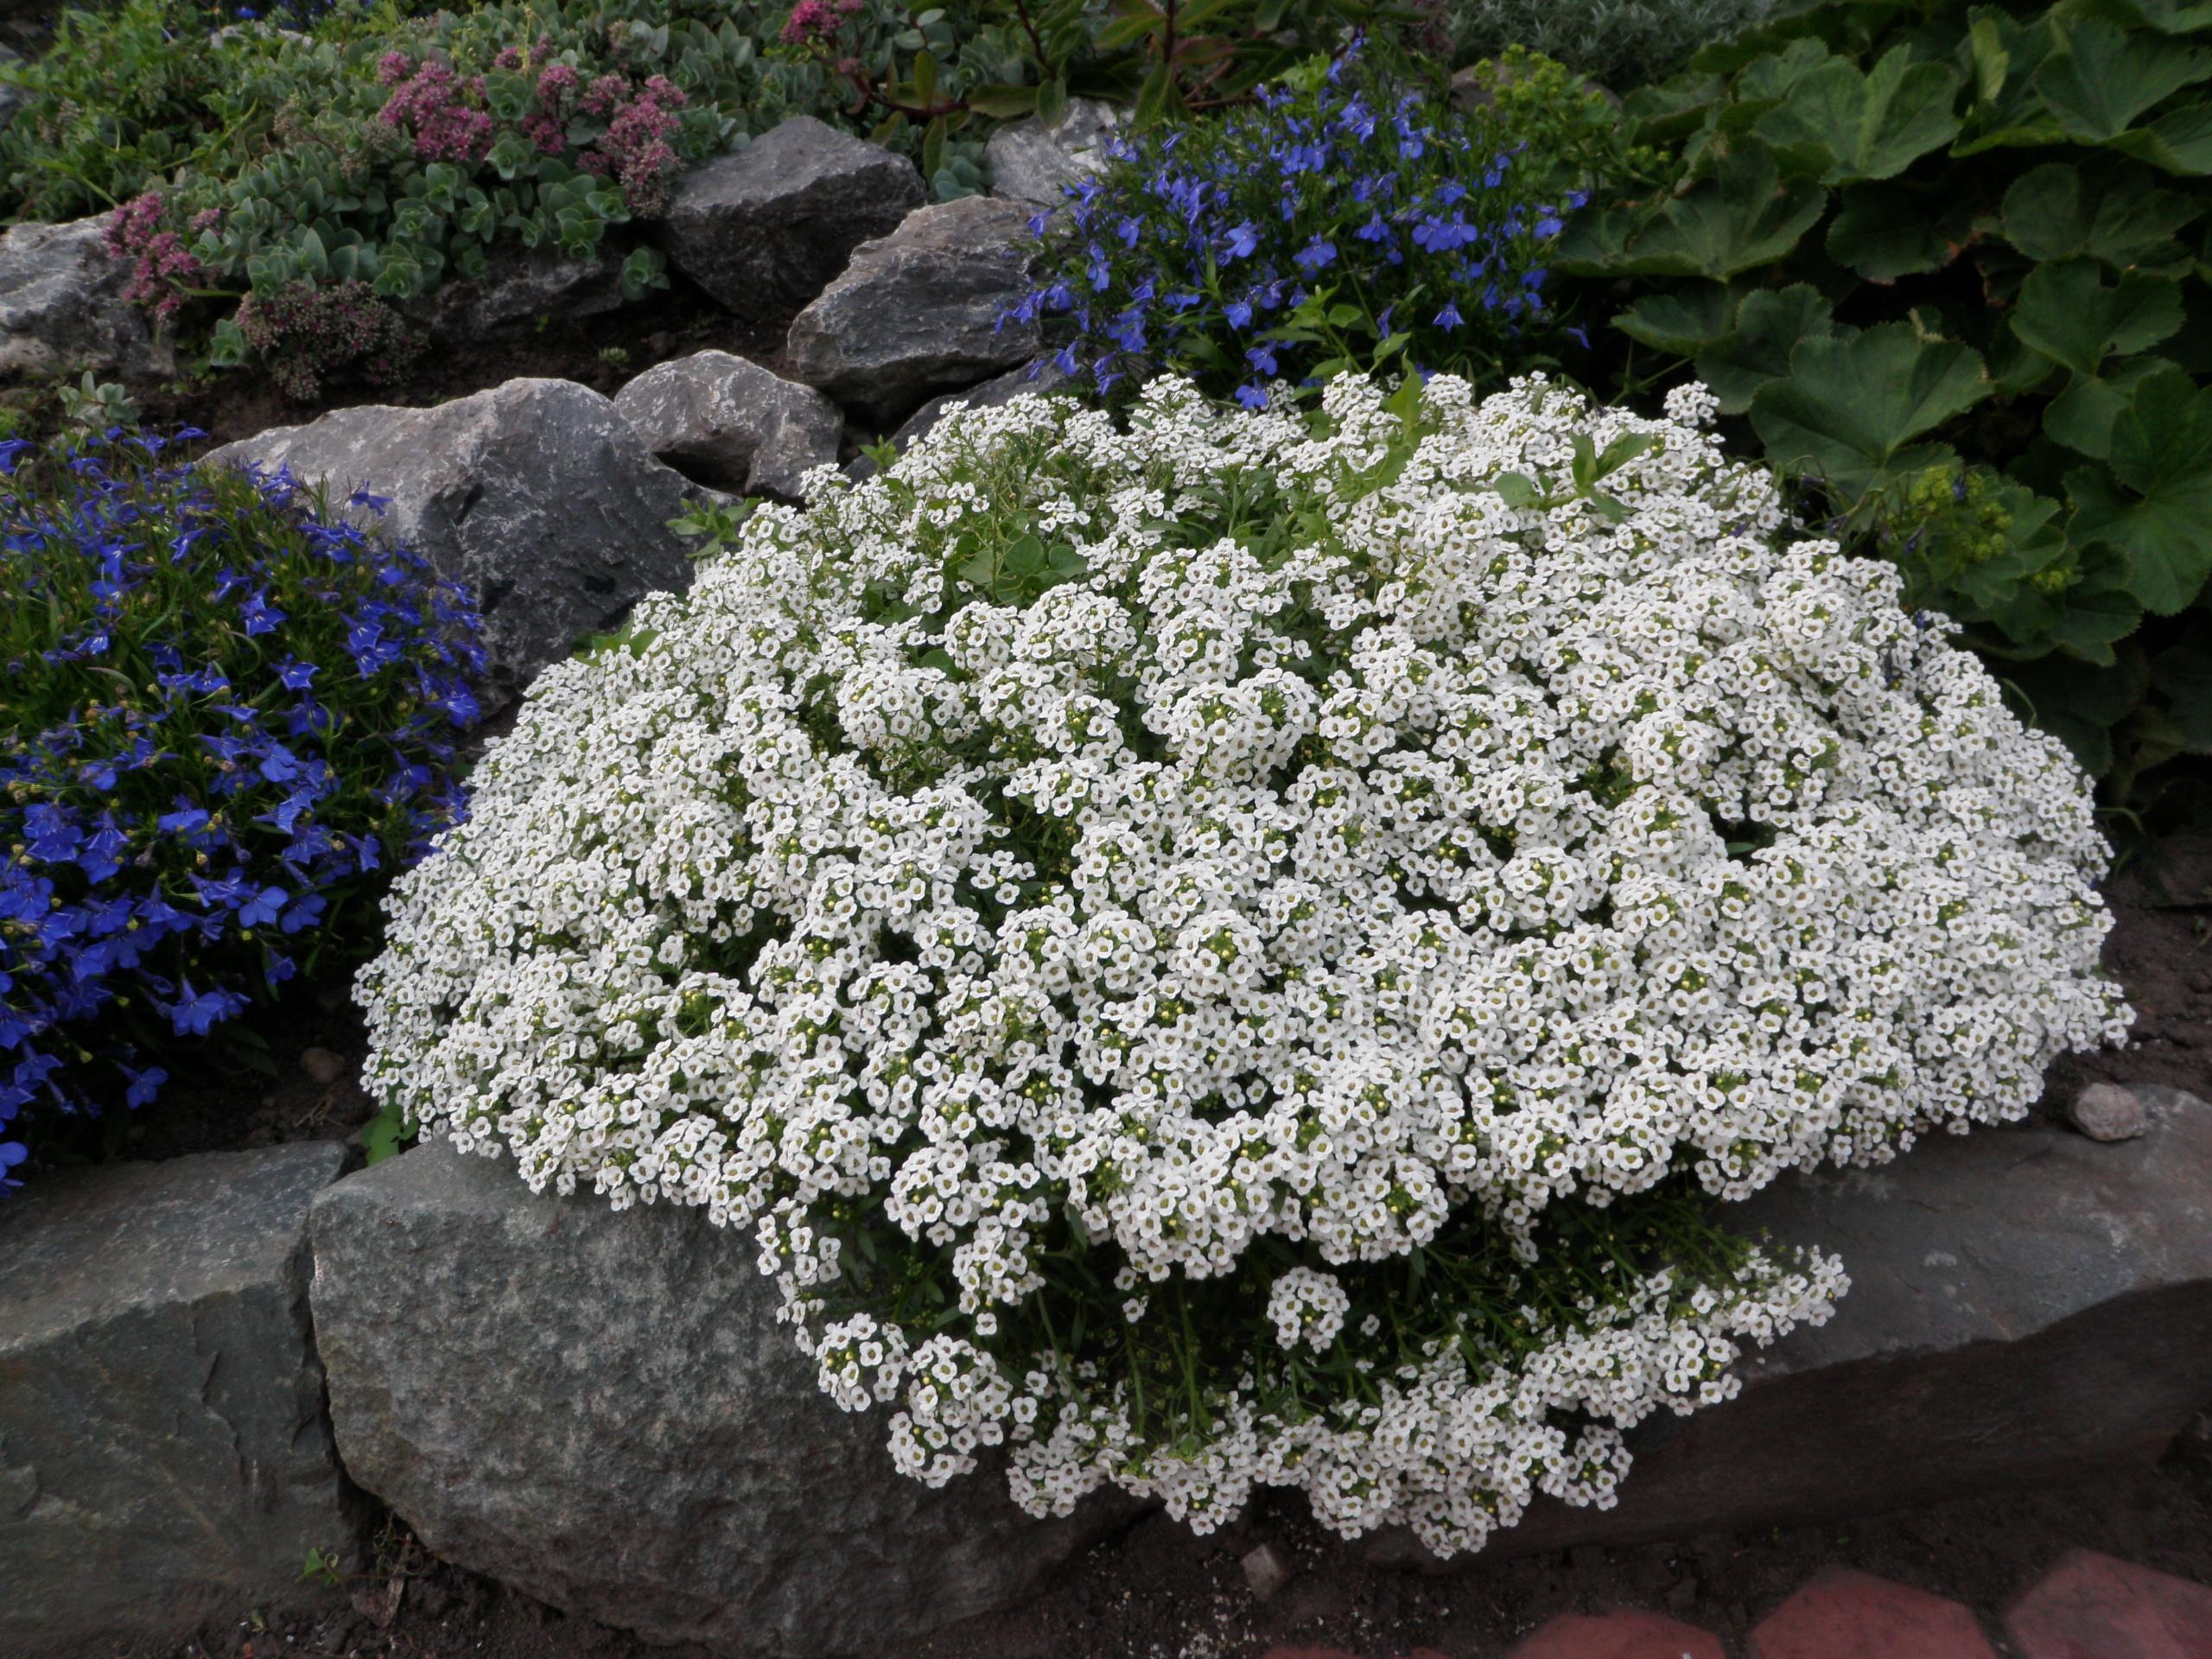 Names Of Flowers A = Pansy B = Nasturtium C = Alyssum D